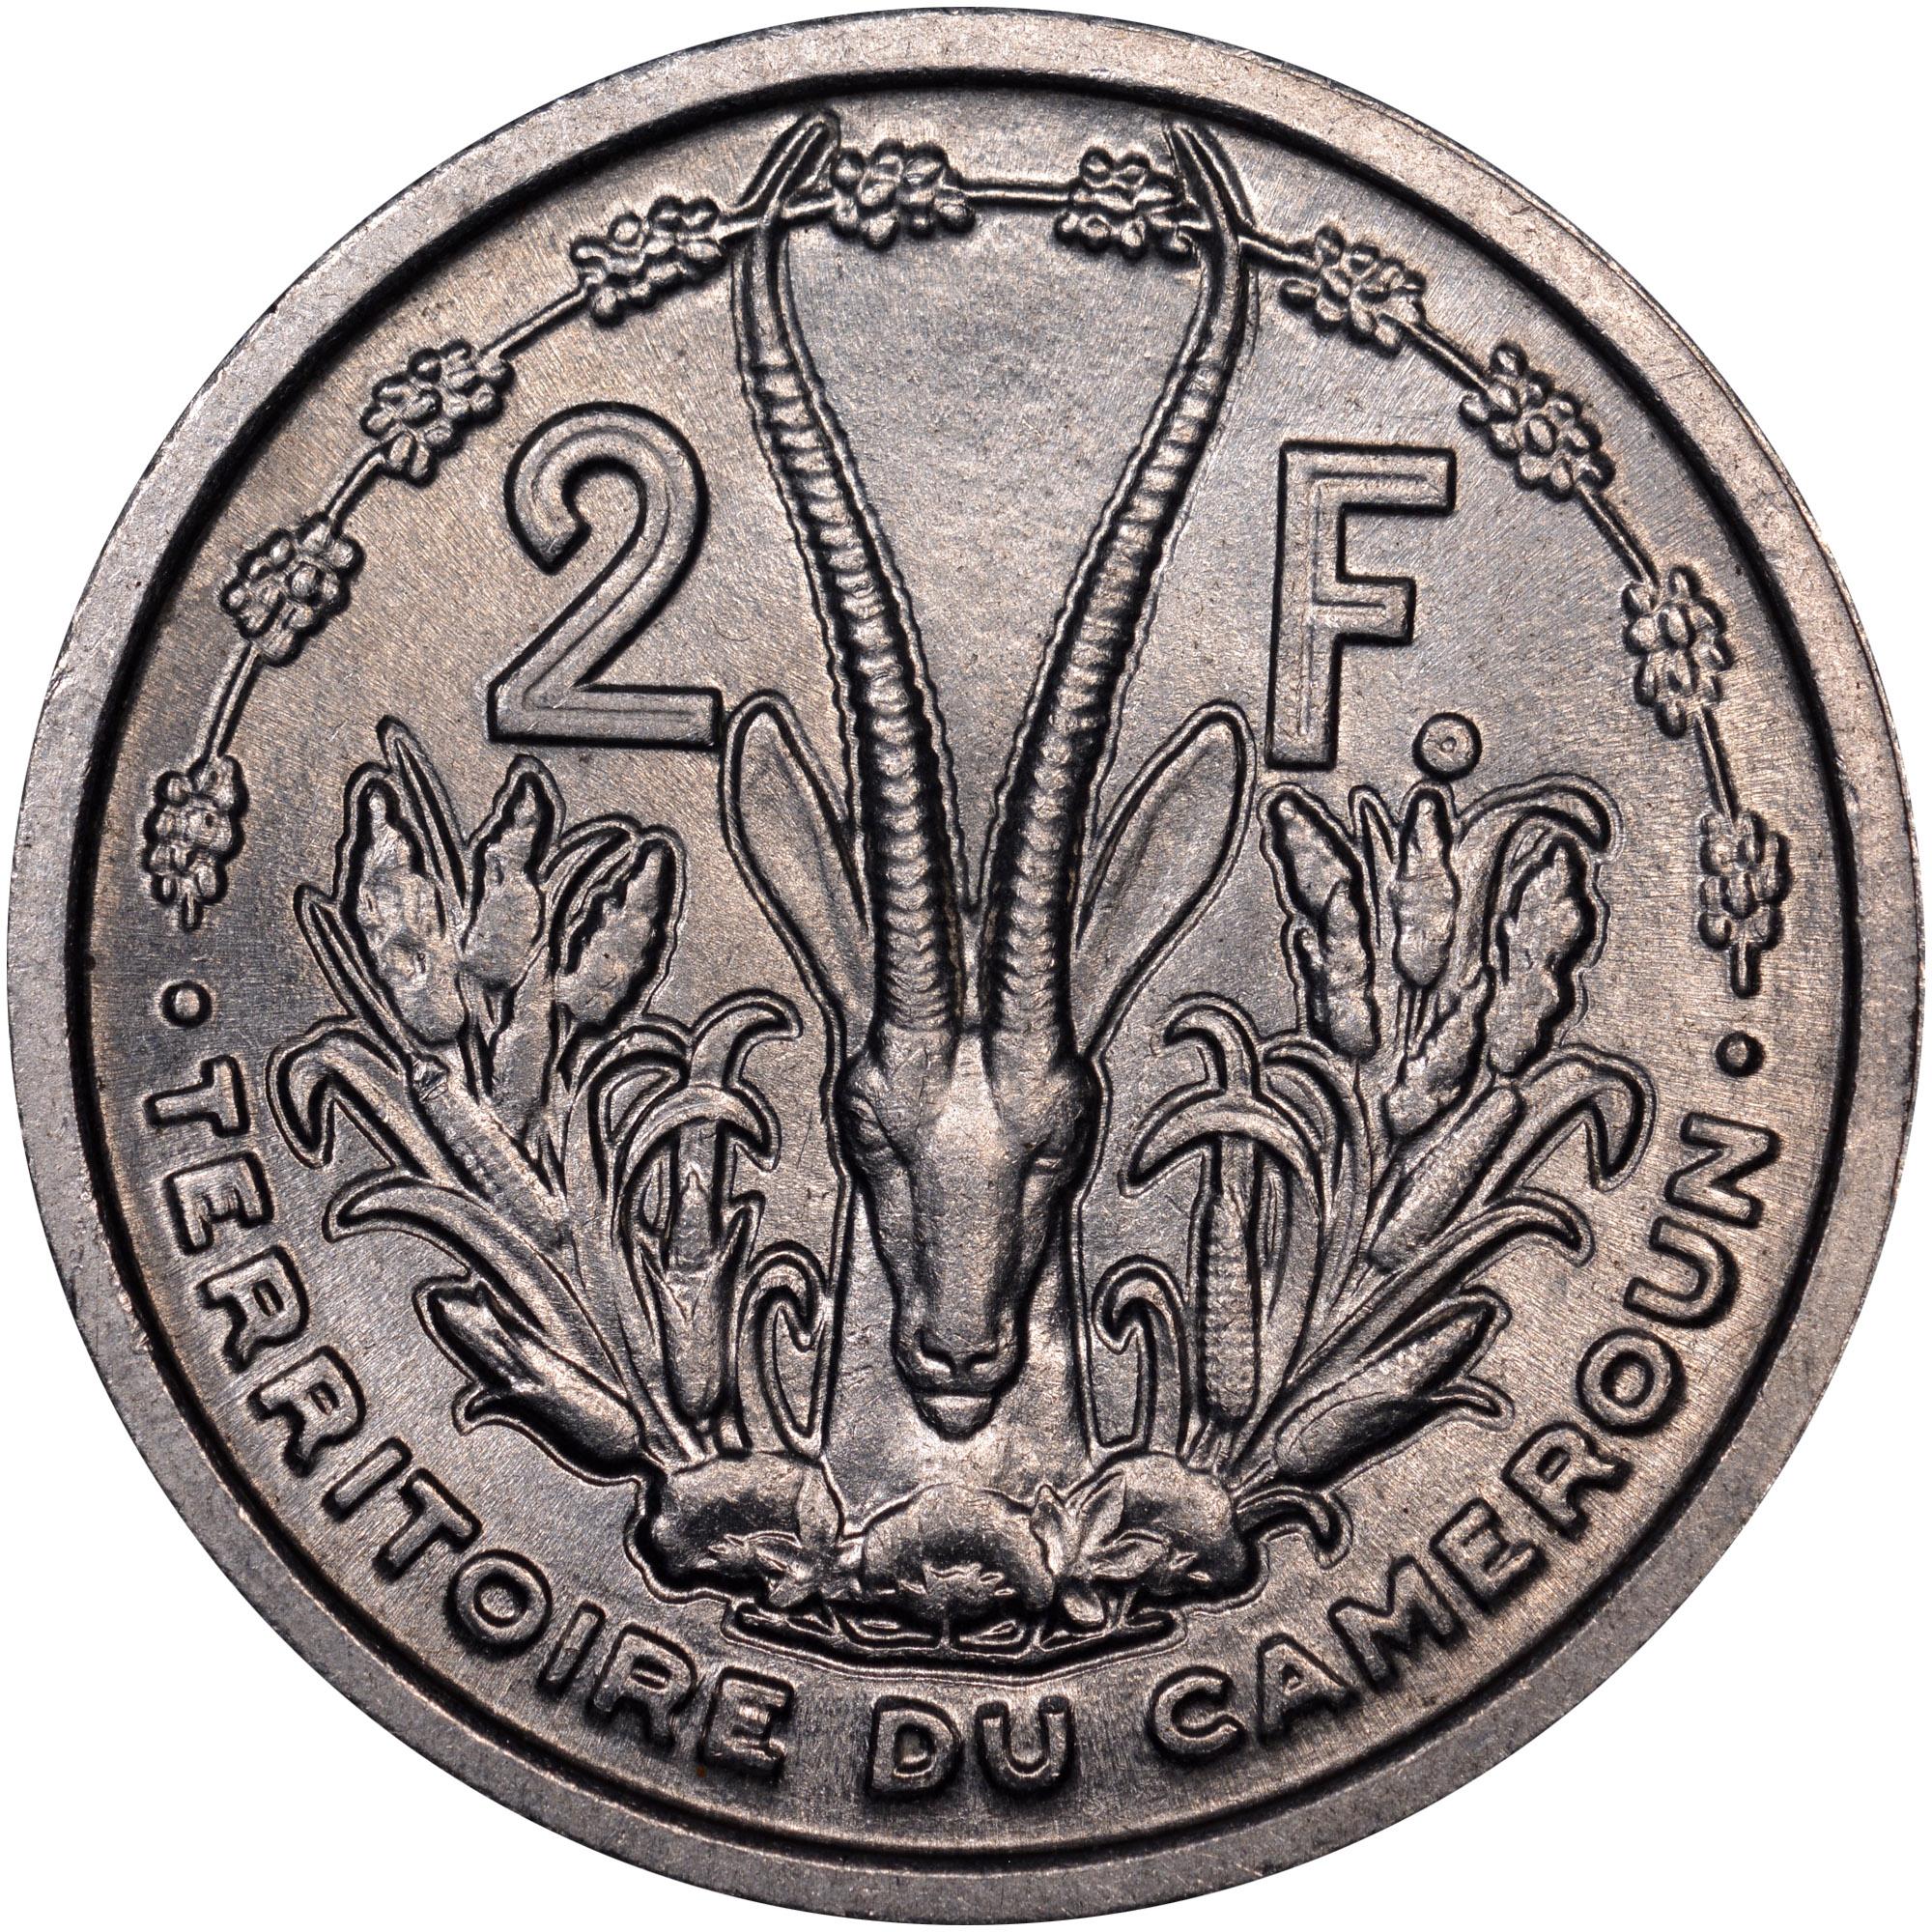 1948 Cameroon 2 Francs reverse